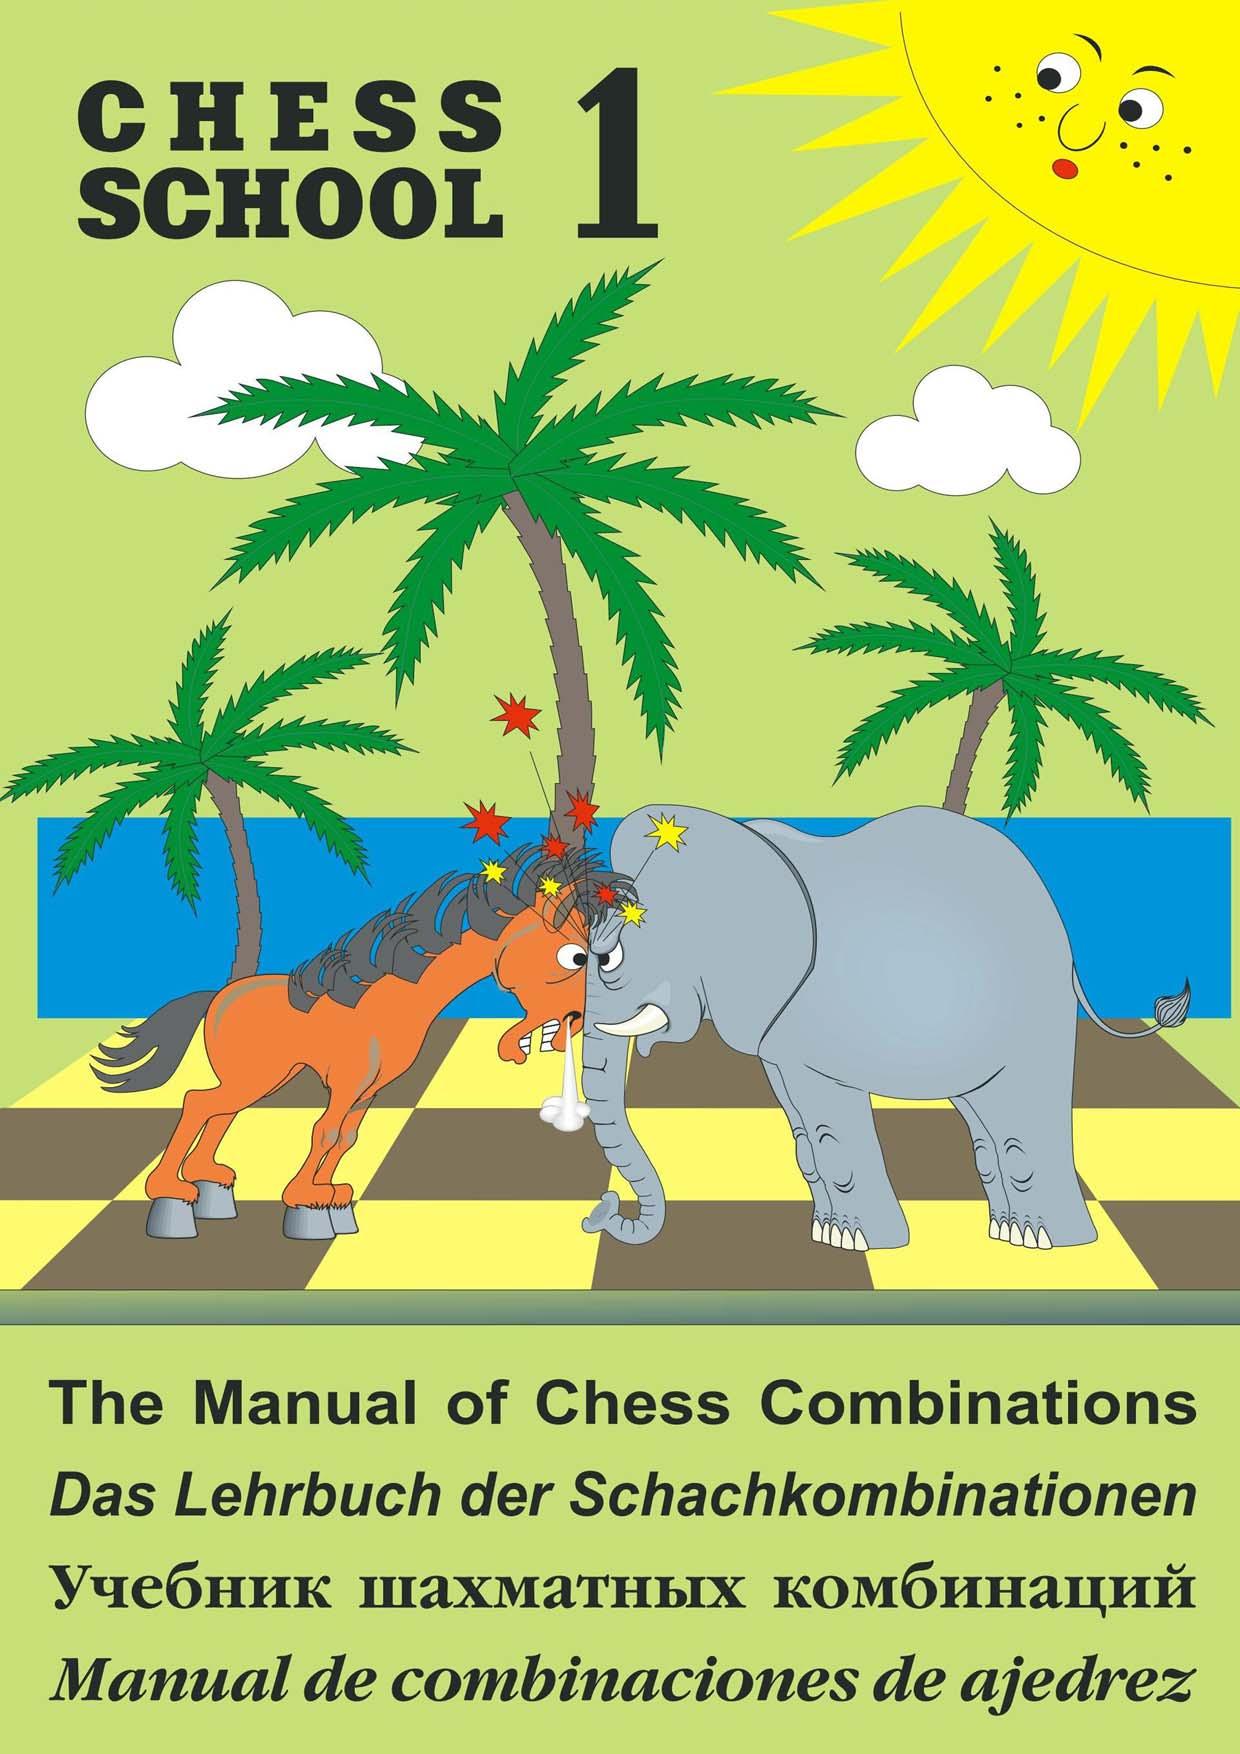 Сергей Иващенко The Manual of Chess Combination / Das Lehrbuch der Schachkombinationen / Manual de combinaciones de ajedrez / Учебник шахматных комбинаций. Том 1